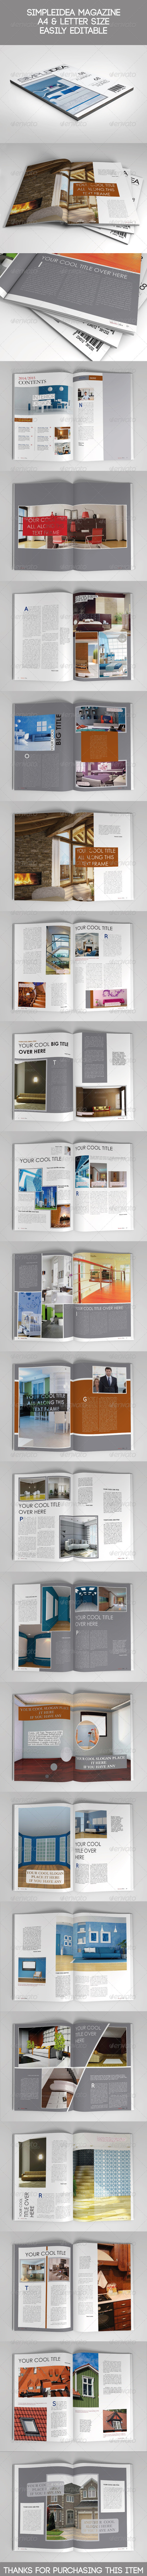 GraphicRiver Simpleidea Magazine Template 7957137